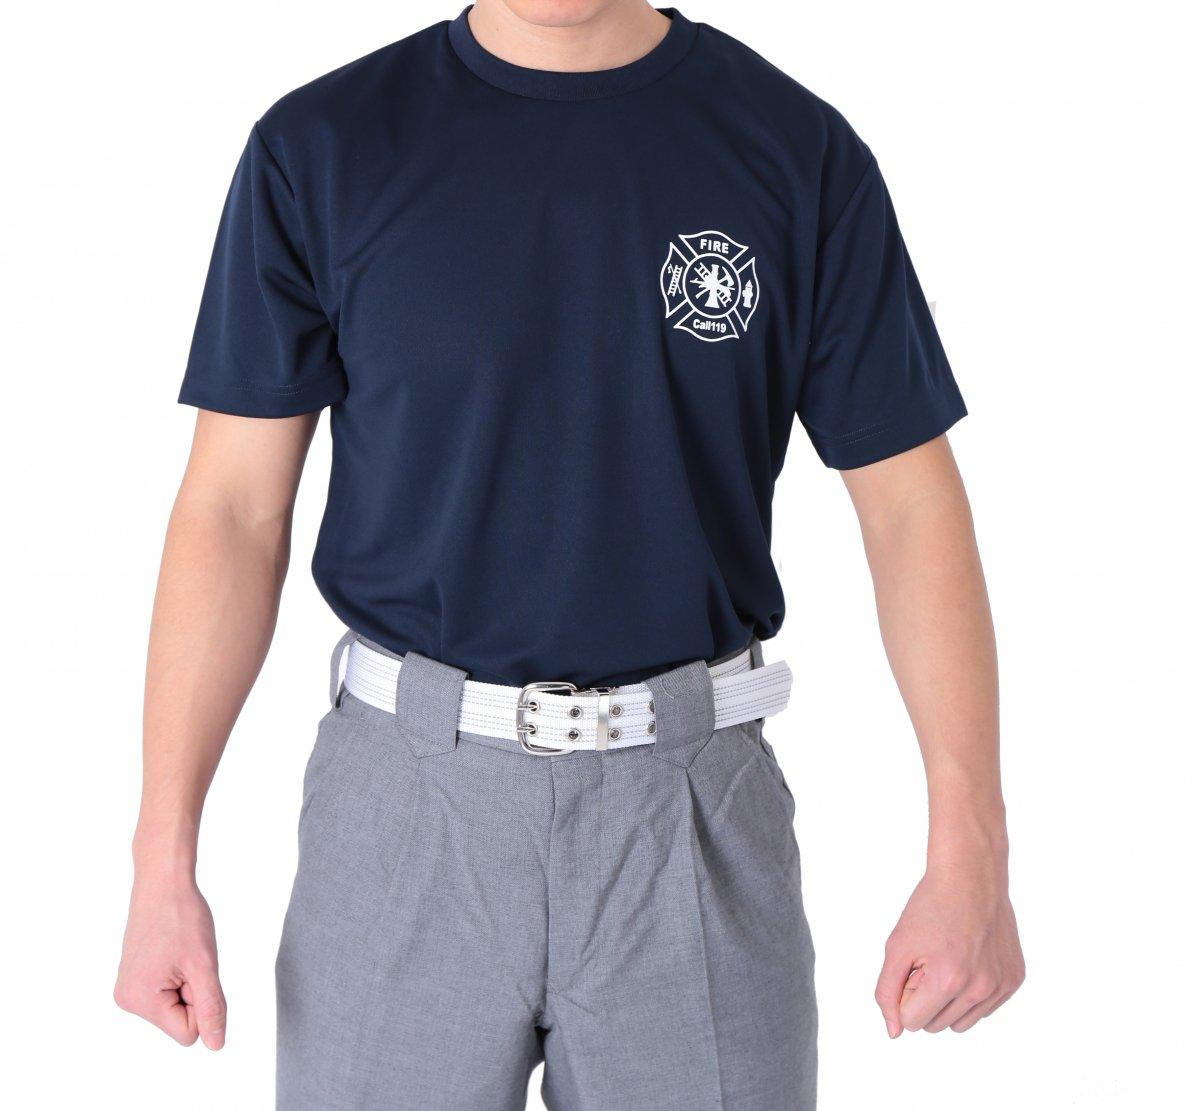 FIRE FIGHTER Call119 デザインTシャツ【画像7】